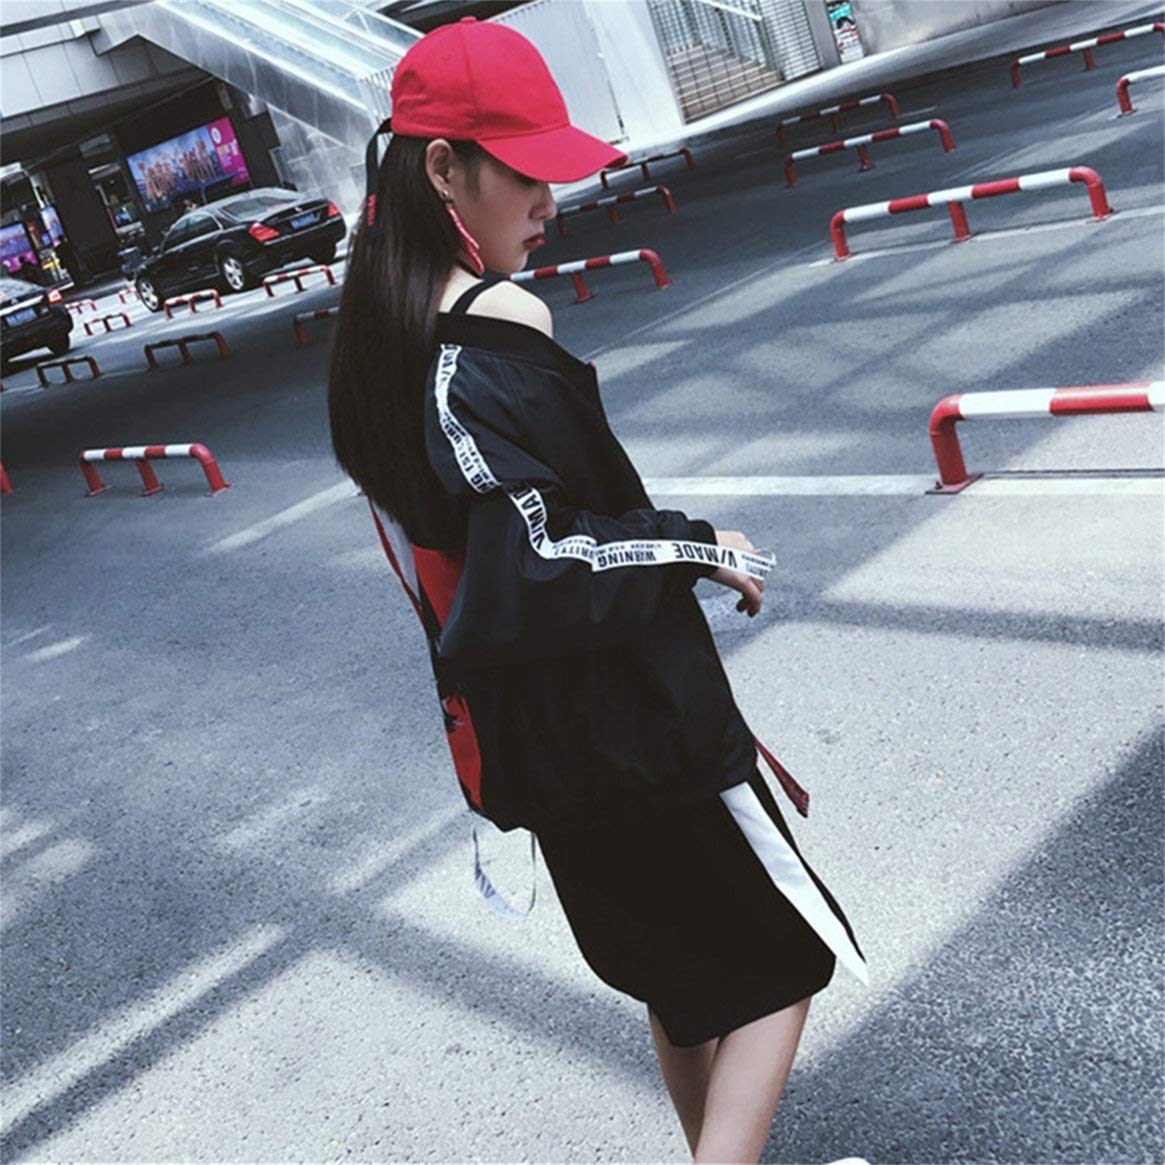 Chicas Costura de la Chaqueta de la Cinta de Manga Larga Color Blocking Uniforme de b/éisbol Harajuku Estilo Protector Solar de Patchwork Cremallera Prendas de Vestir Exteriores